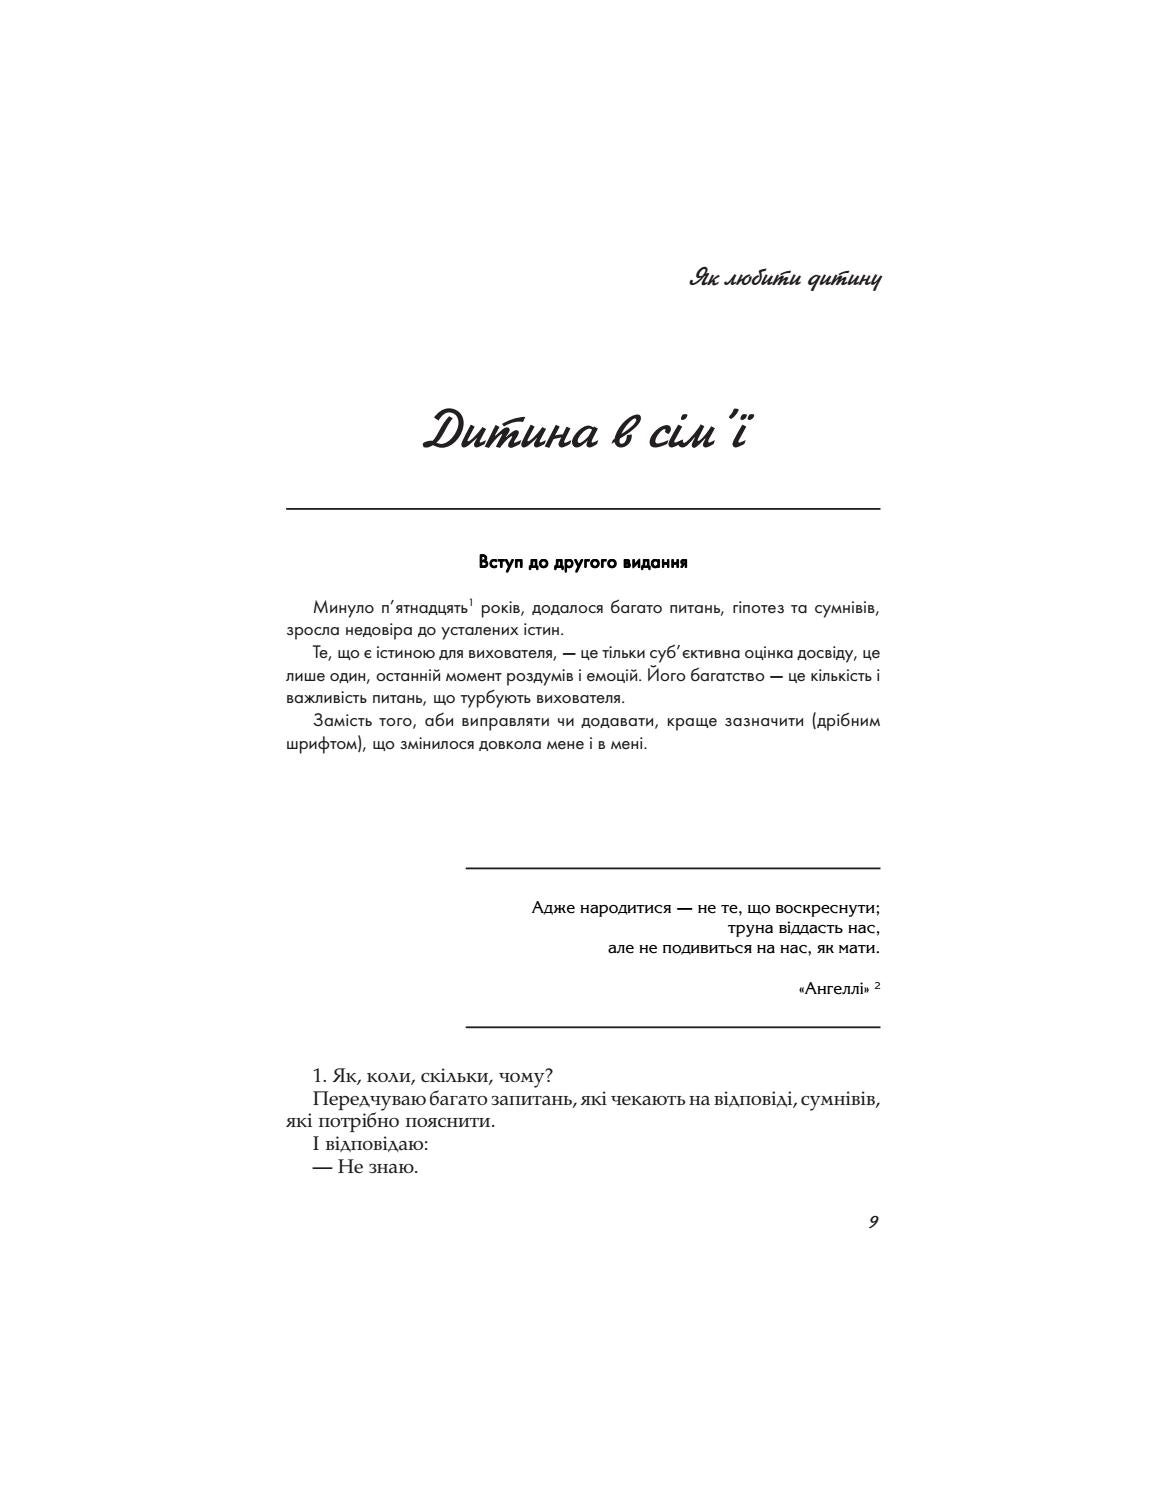 Корчак дитя людське by Judaica Center - issuu 5350c1cdb5b43